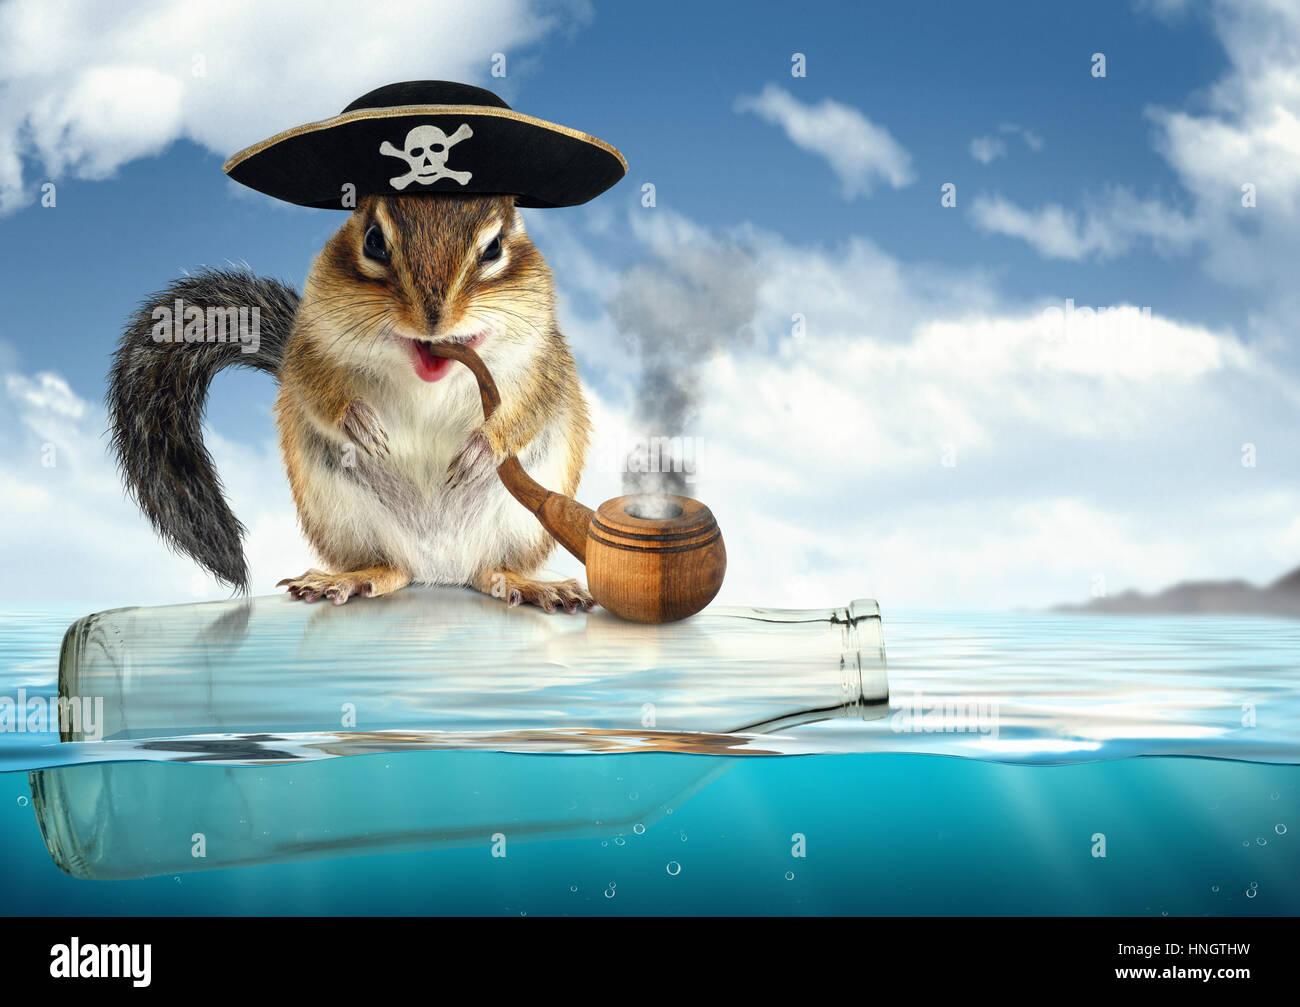 Funny Animal Pirate Stockfotos & Funny Animal Pirate Bilder - Alamy